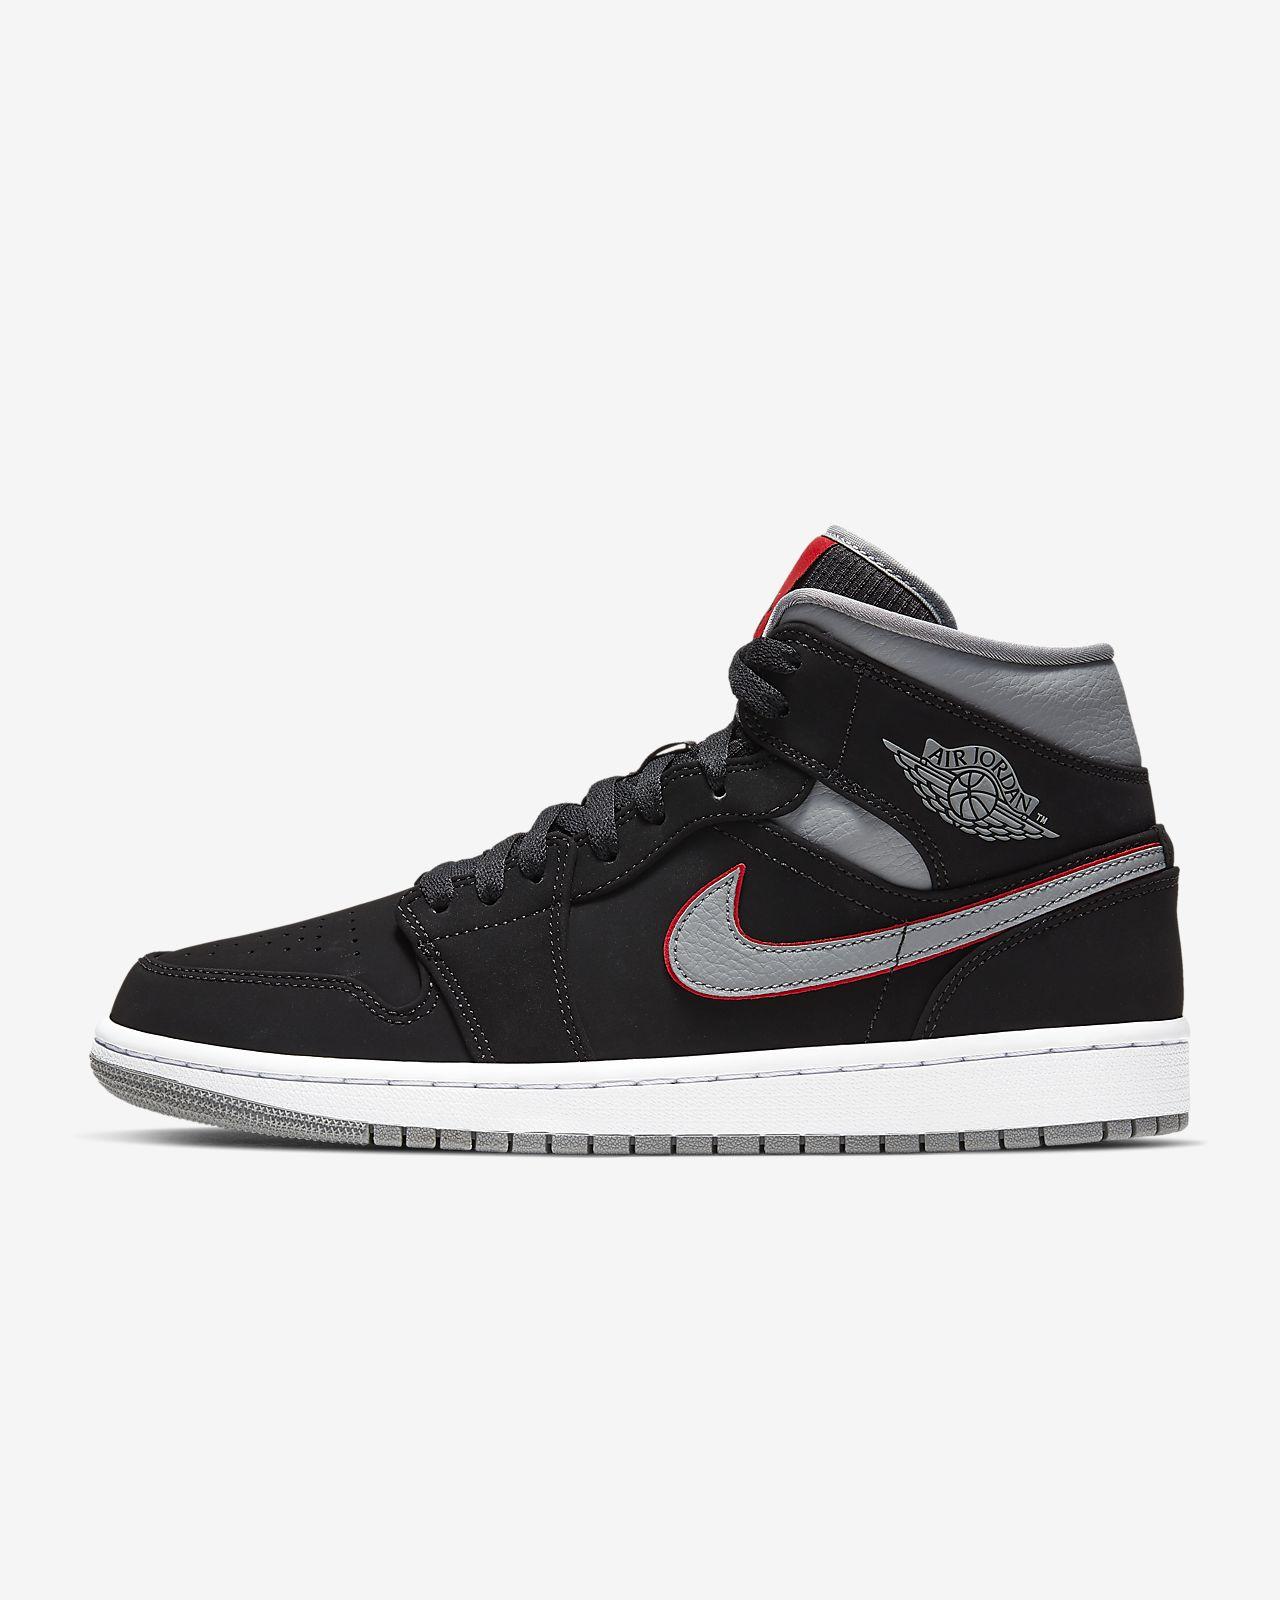 724fb04a8625f Chaussure Air Jordan 1 Mid pour Homme. Nike.com CA